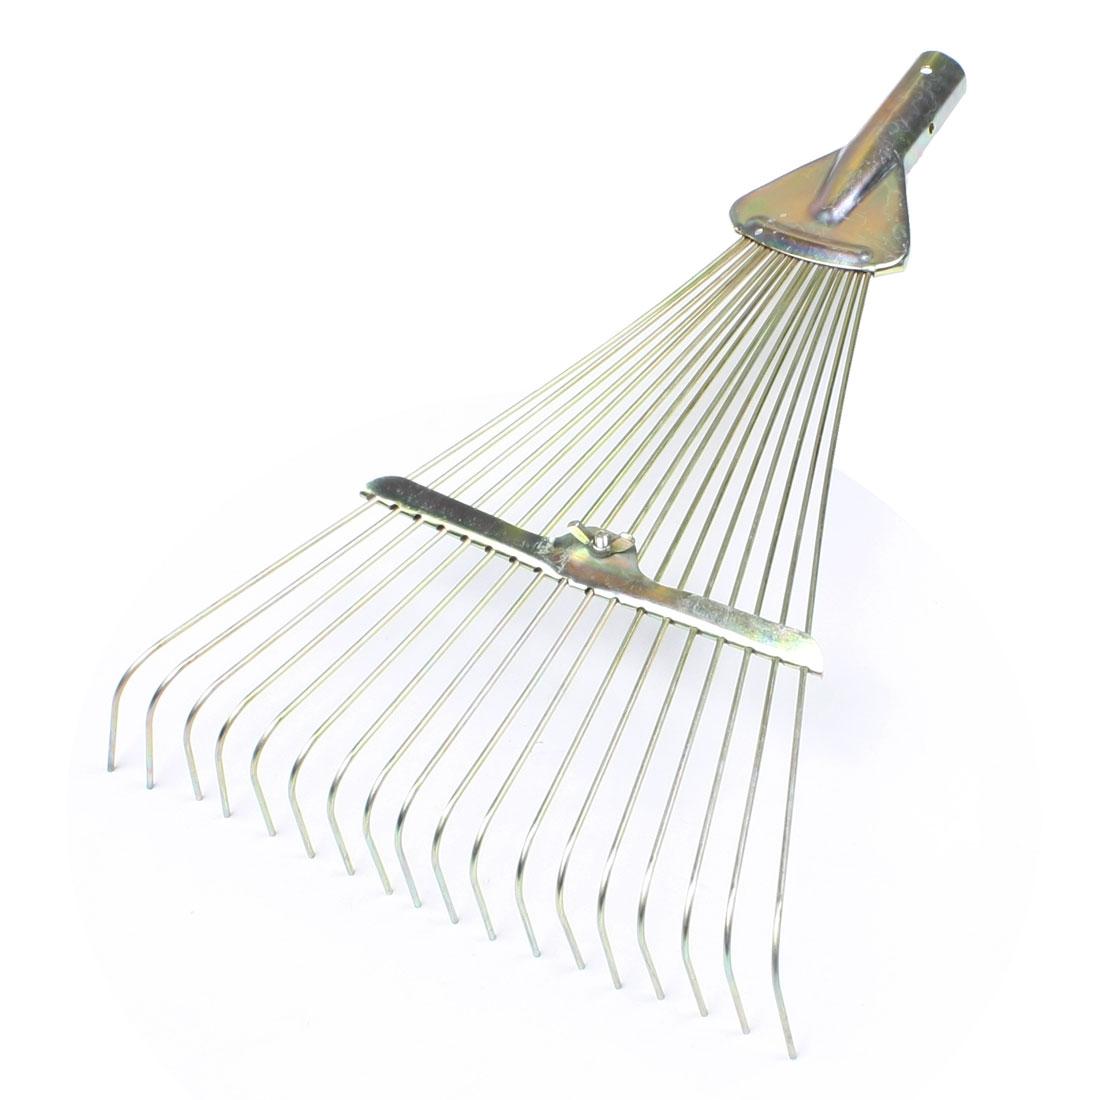 Gold Tone 18 Tine Cultivator Rake Gardening Tool Trowel Fork Head